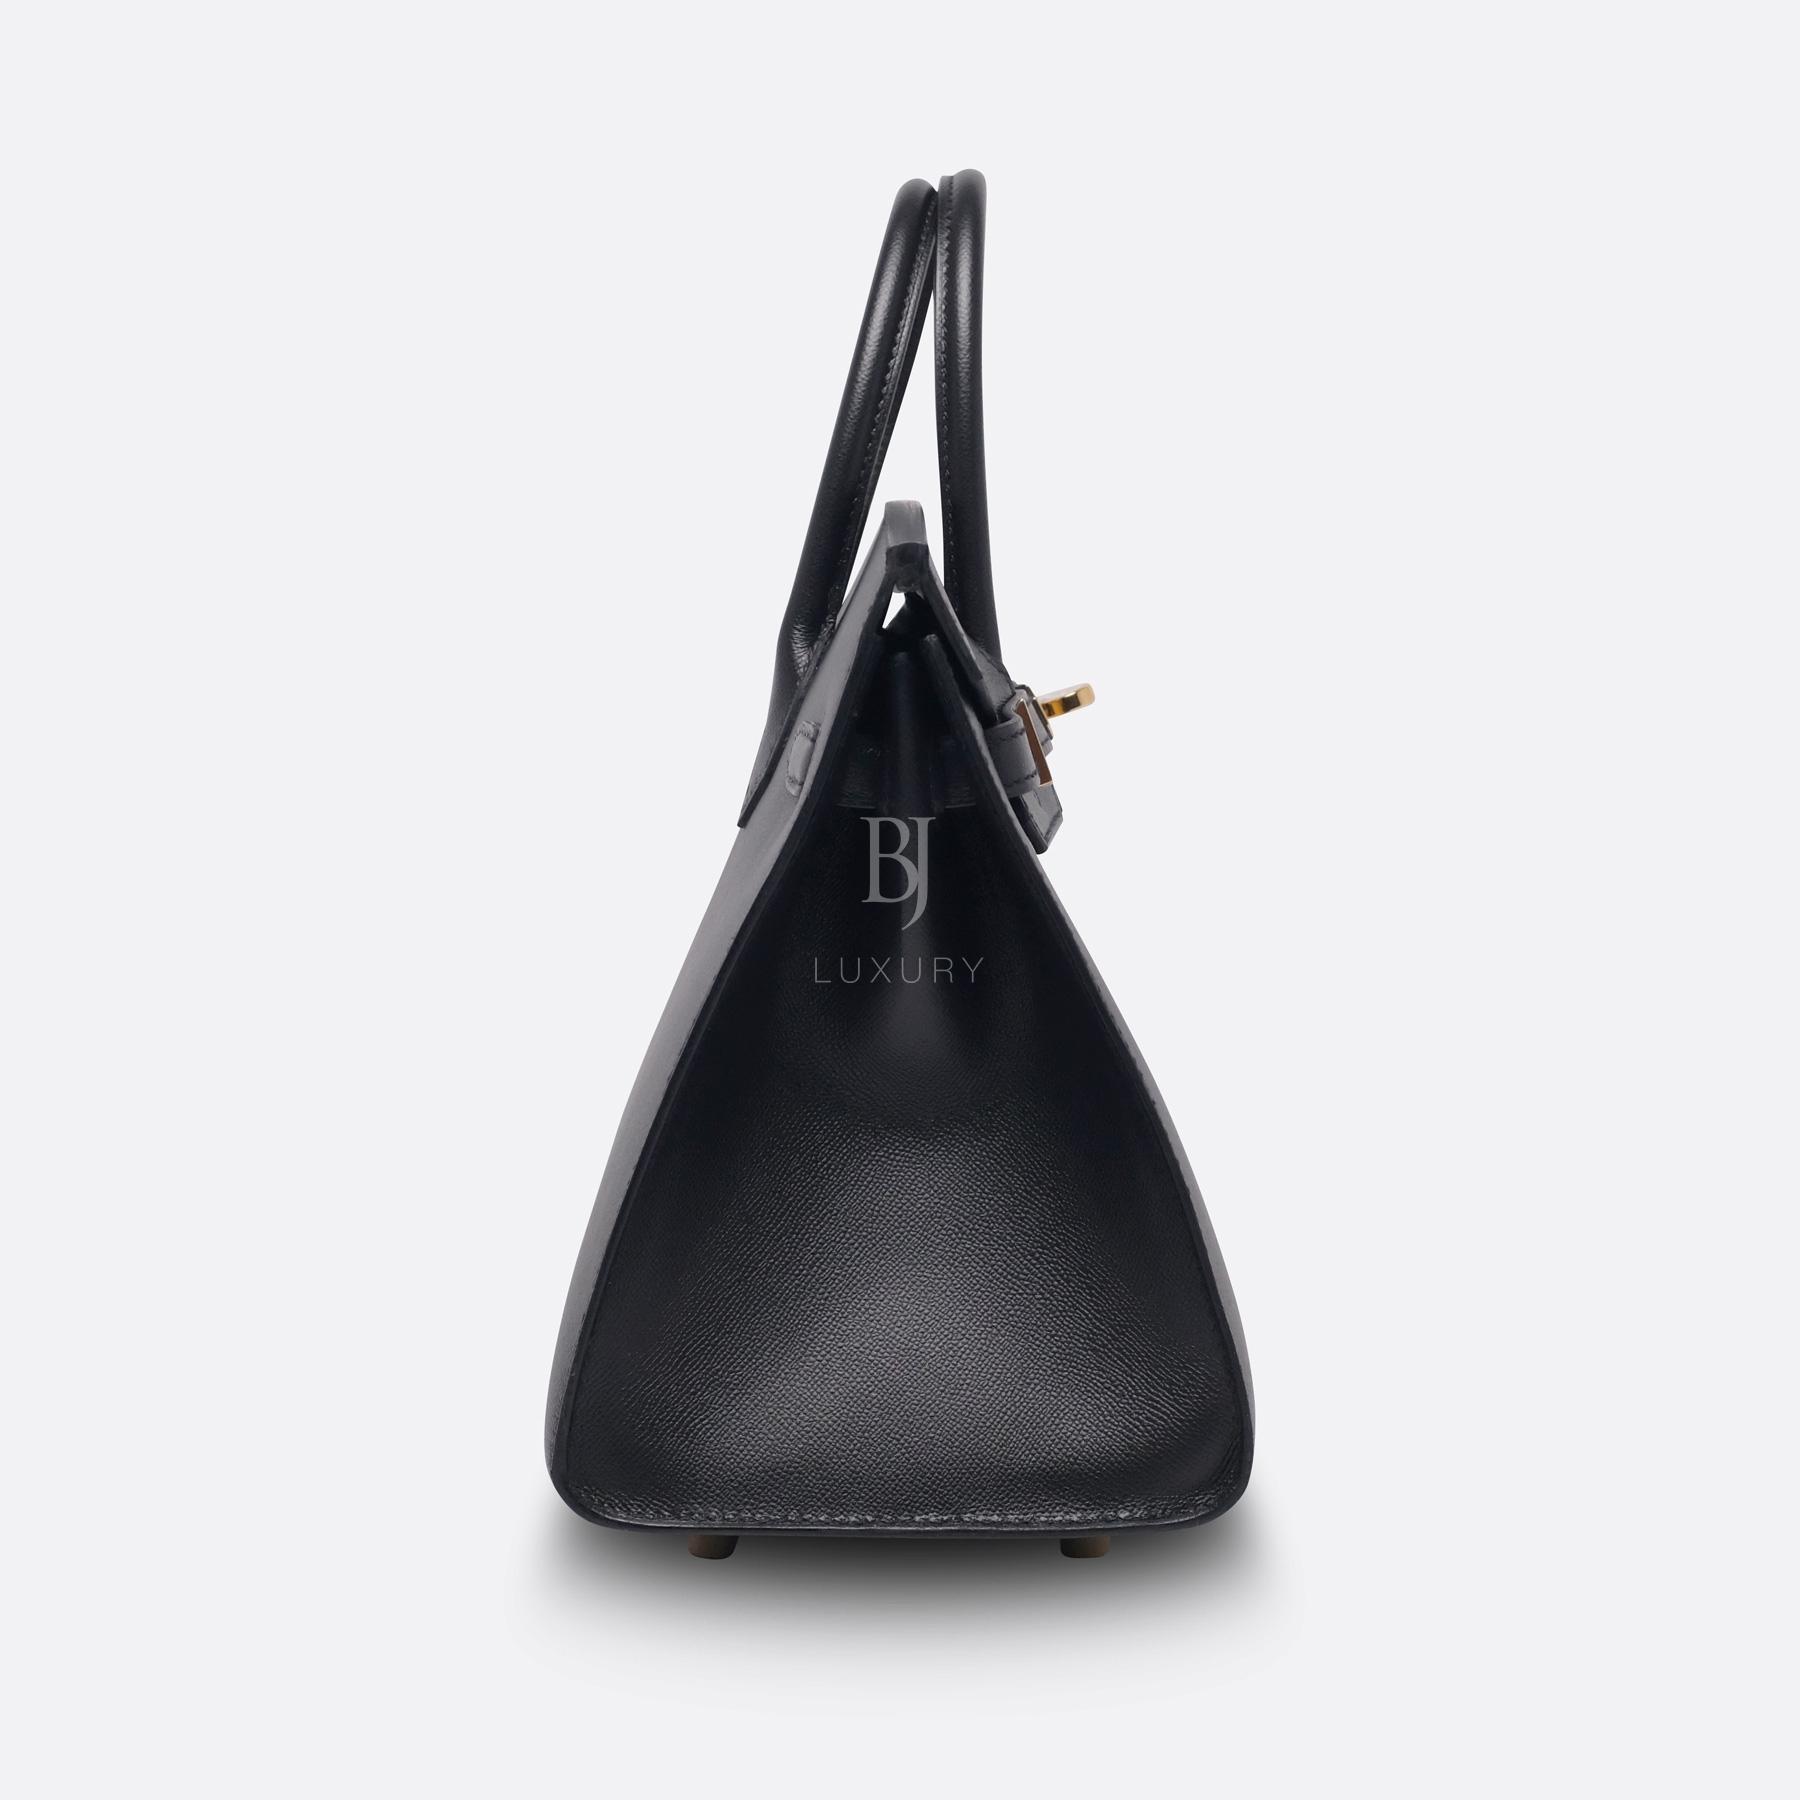 Birkin Sellier 25 Black Veau Madame Gold BJ Luxury 11.jpg